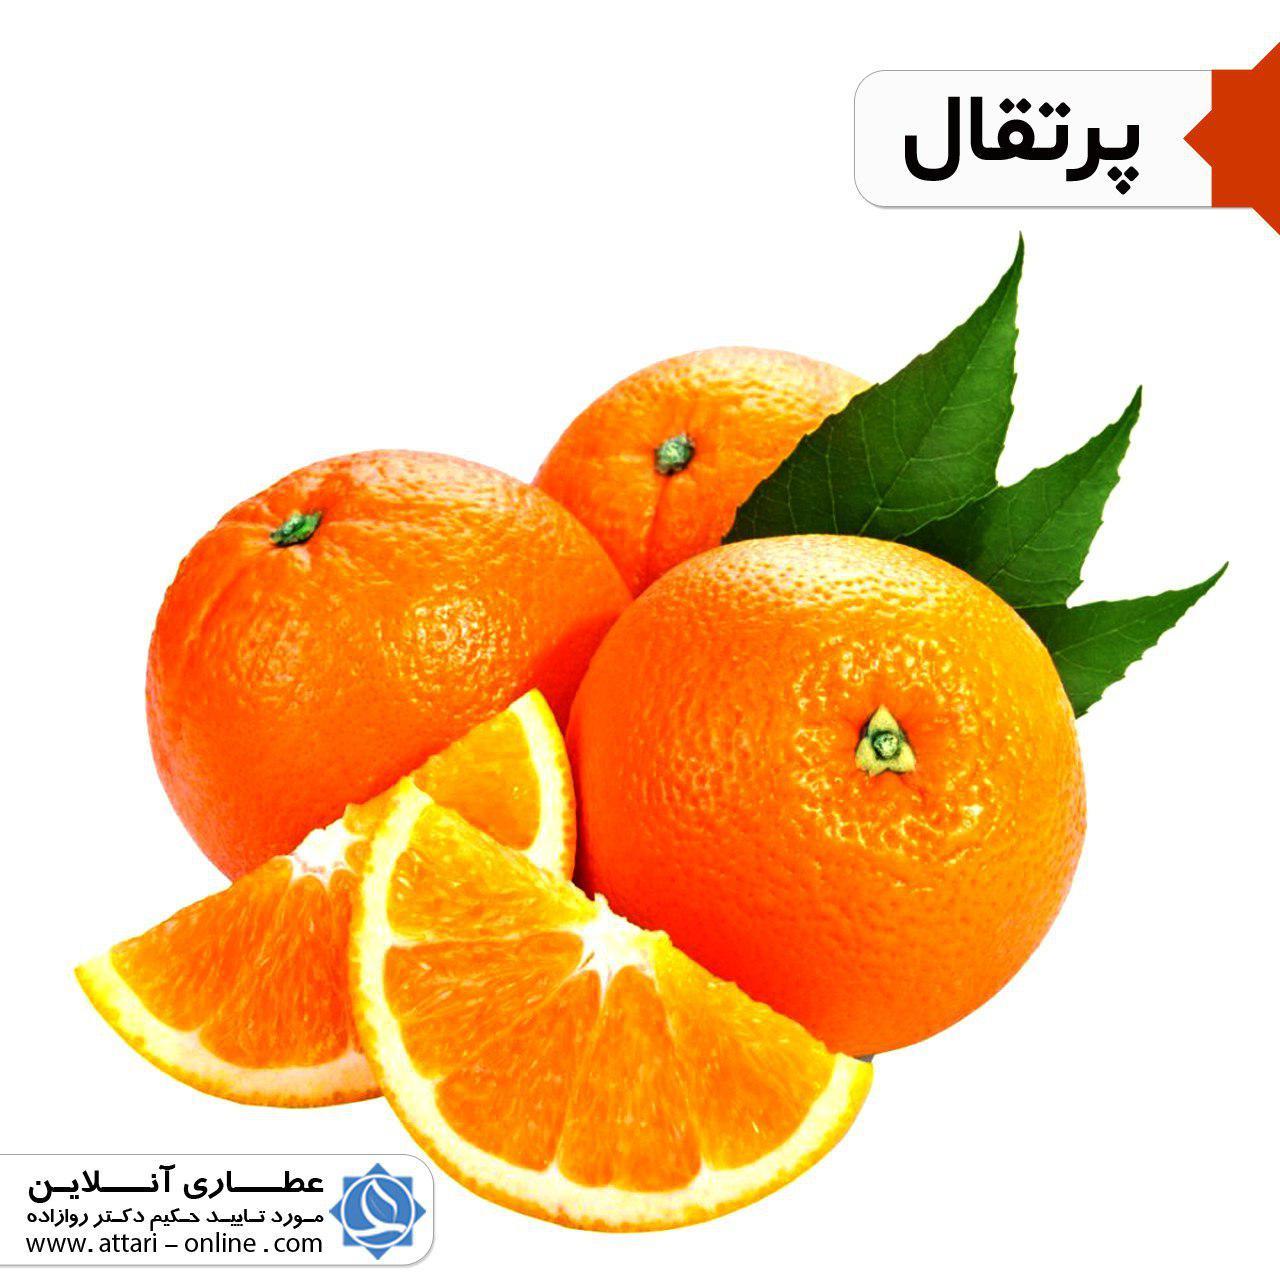 photo 2018 12 09 15 18 09 پرتقال، این نارنجی دلپذیر